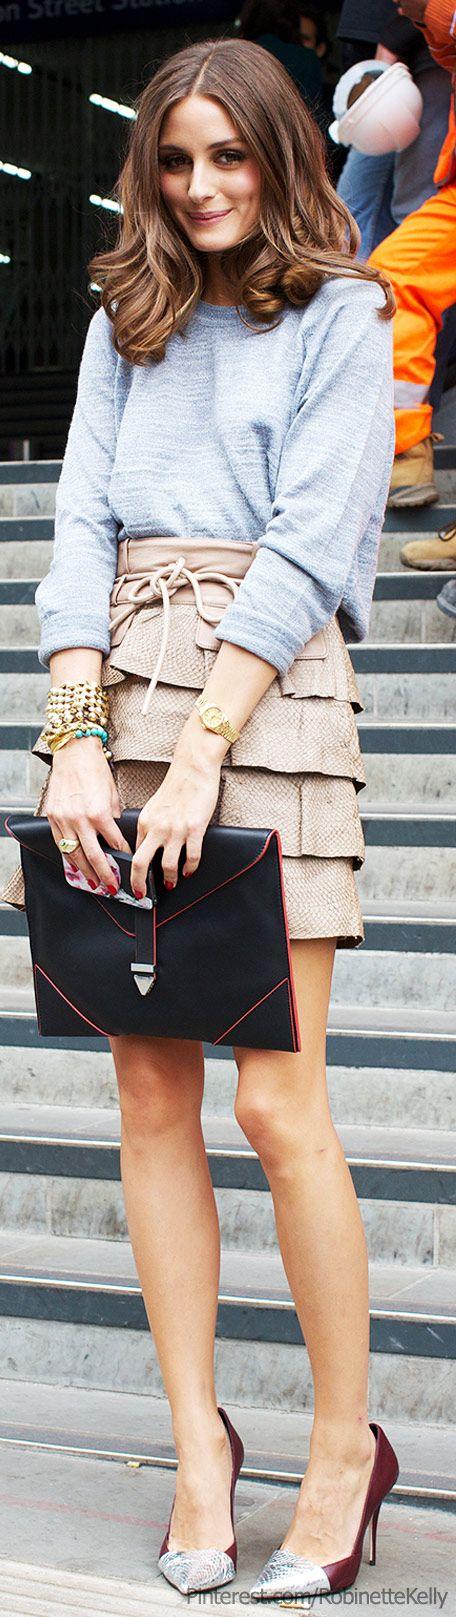 Street Style | London Fashion Week Spring/Summer 2013; Olivia Palermo